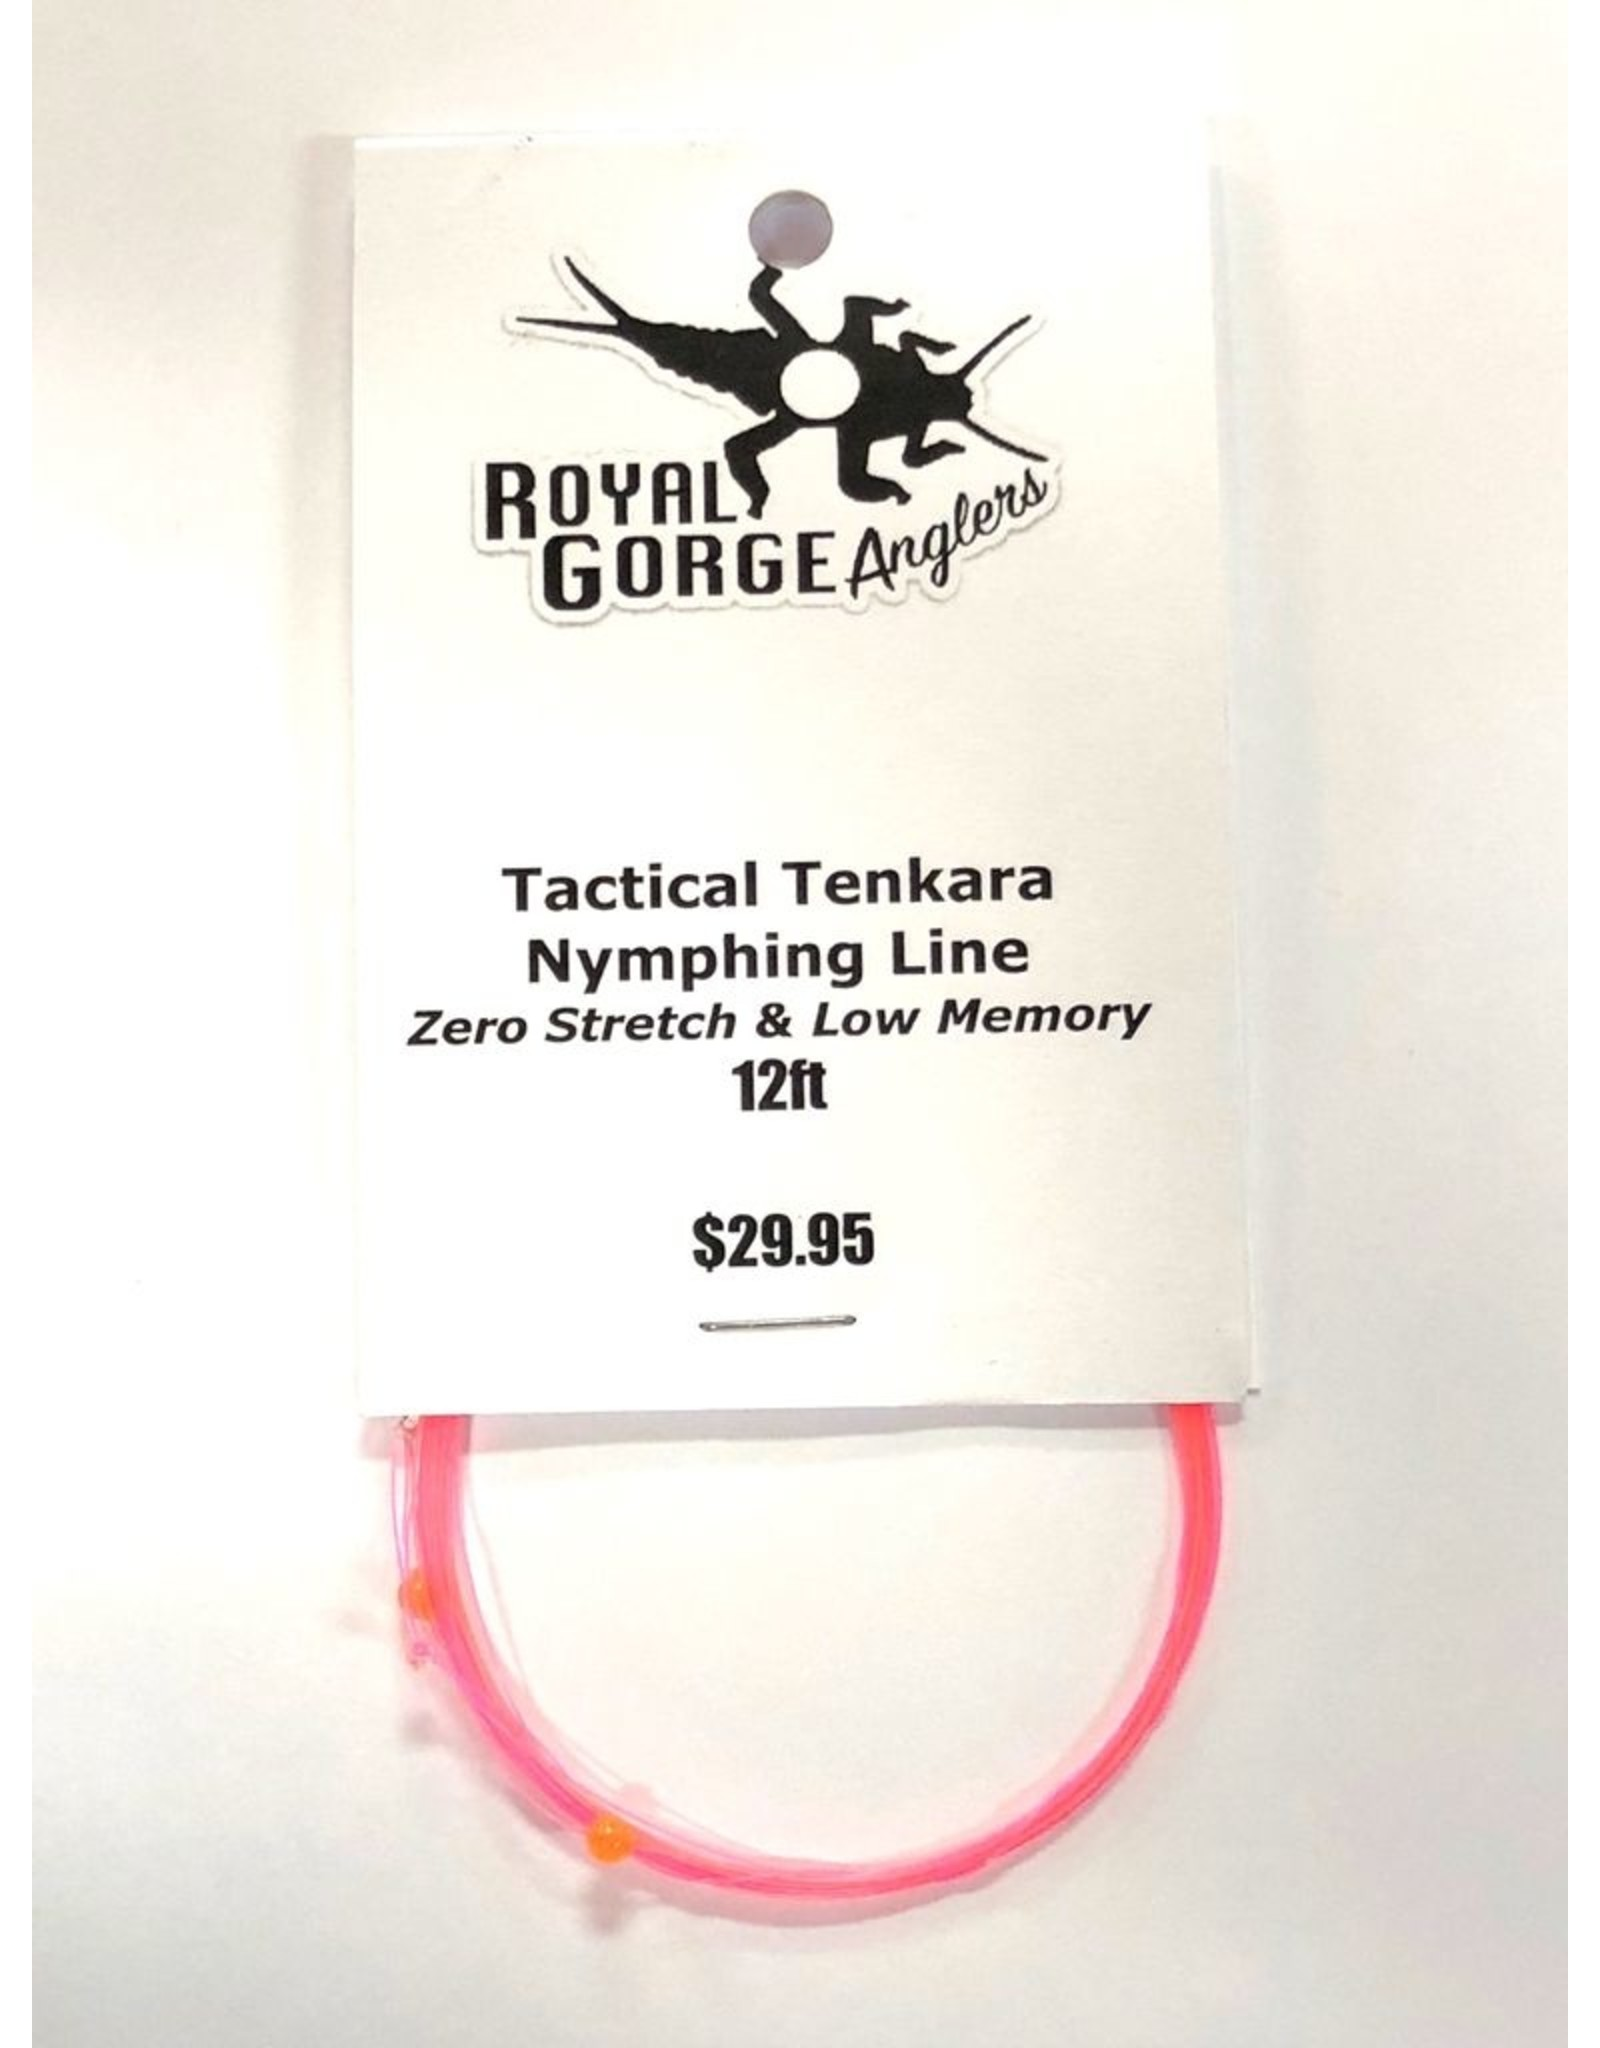 Tenkara Angler Gift Guide - RGA Tactical Tenkara Nymphing Line